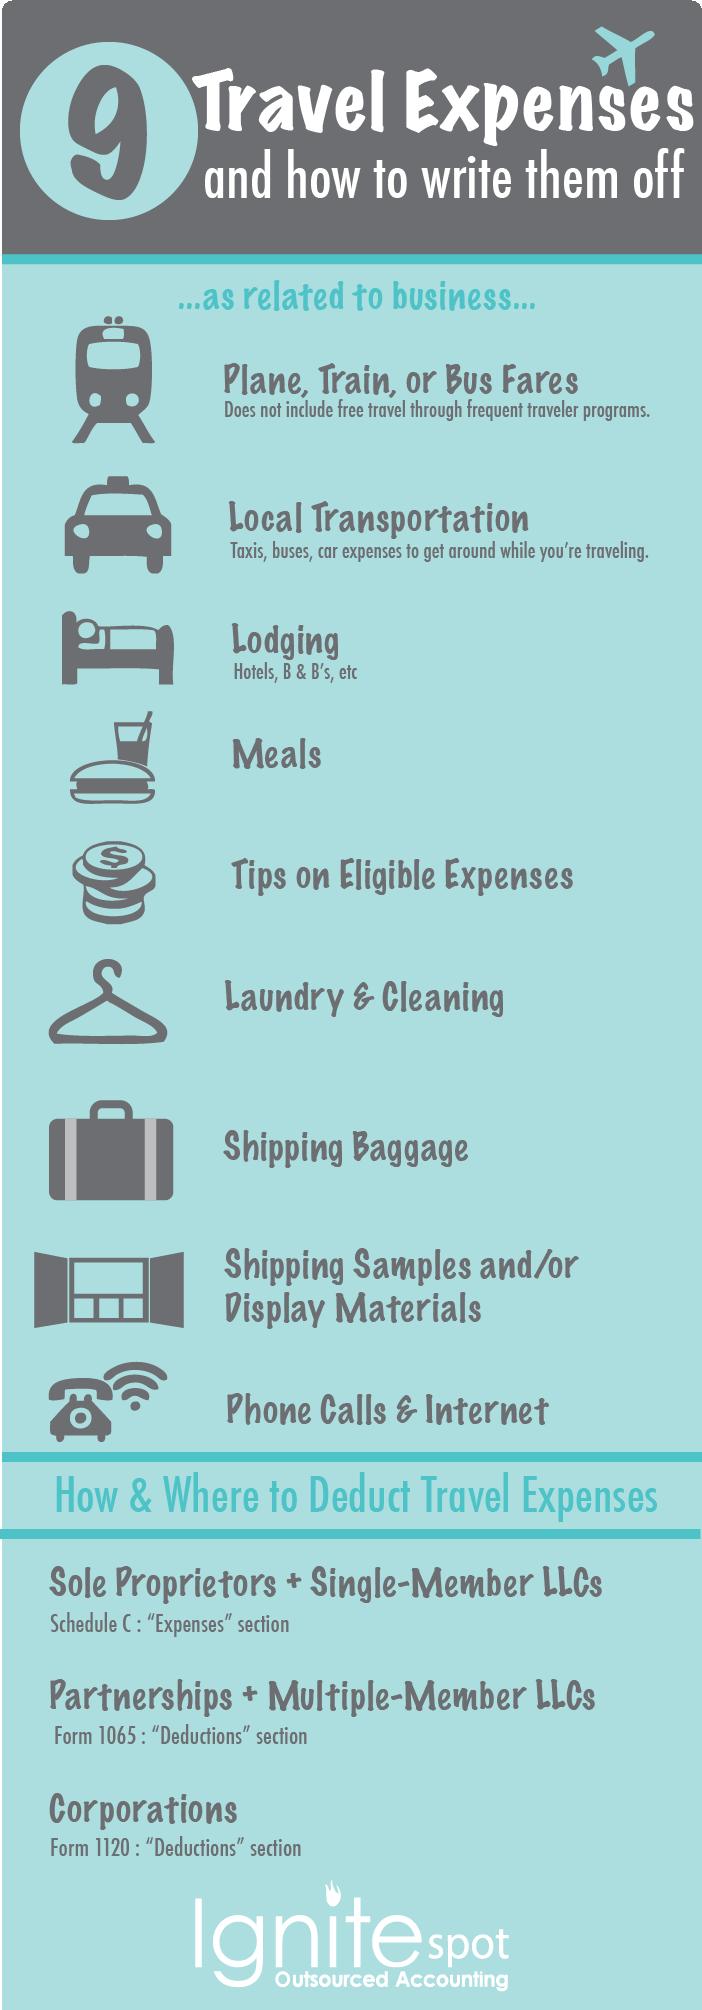 travel_expenses_infographic